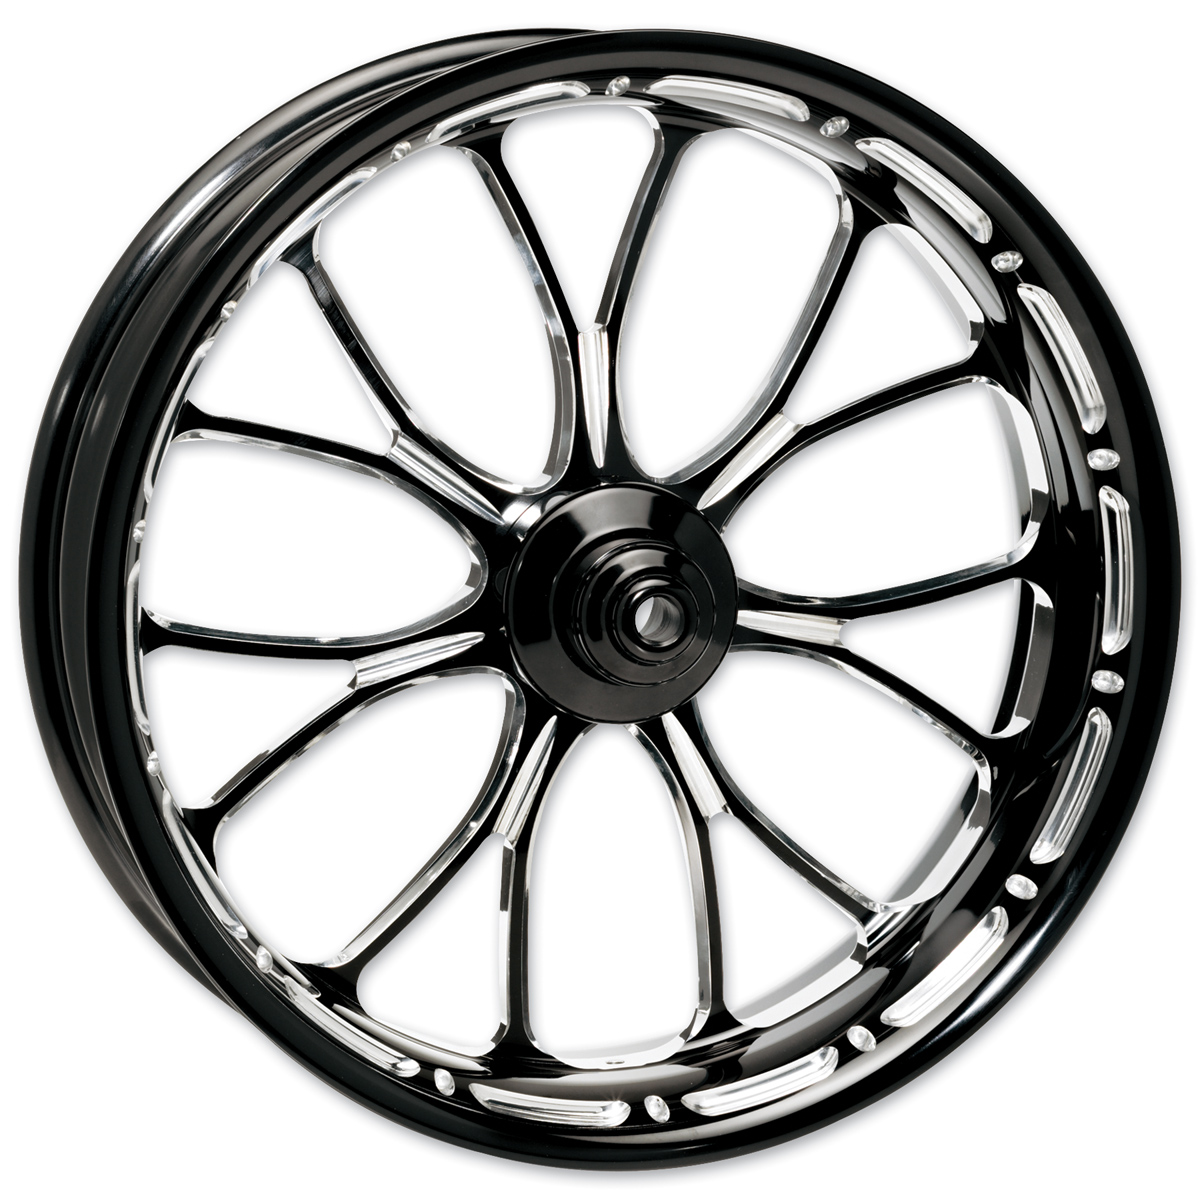 Performance Machine Heathen Platinum Cut Rear Wheel 17x17.6 Non-ABS